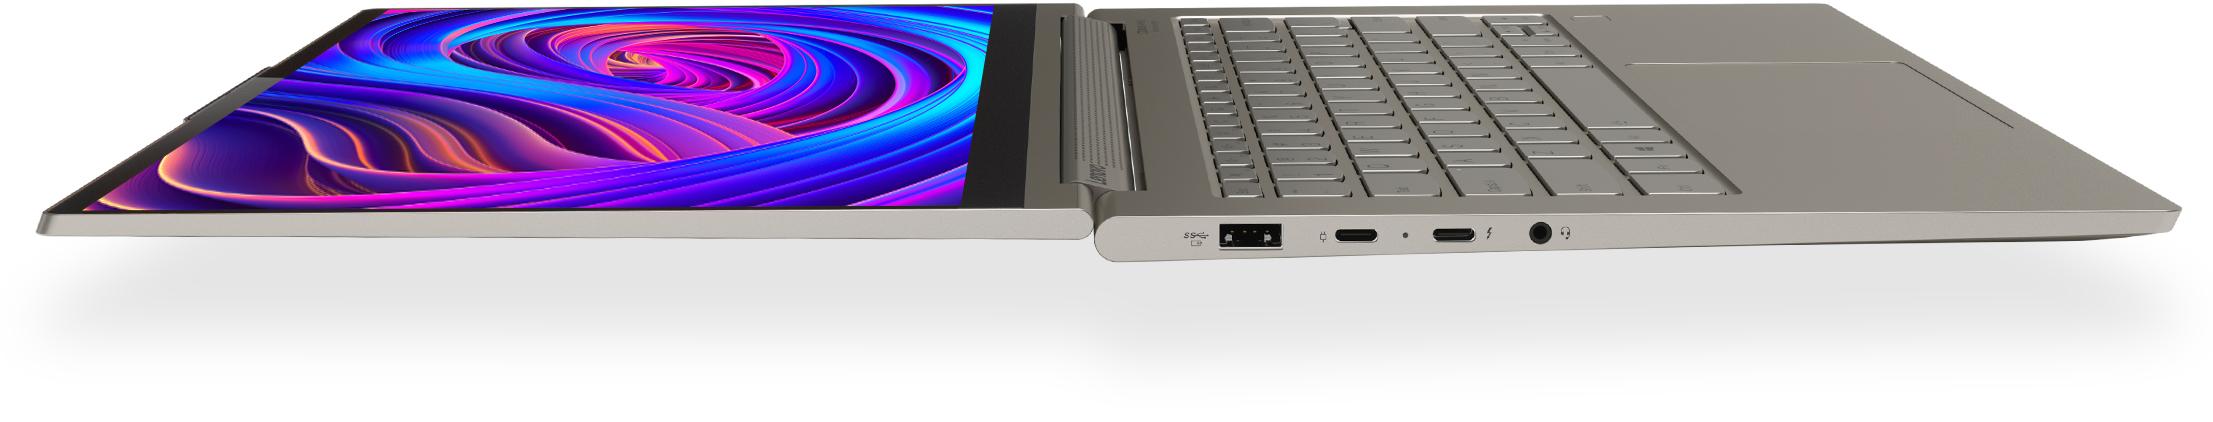 Lenovo Yoga   Best 2-in-1 Laptops & Convertibles   Lenovo